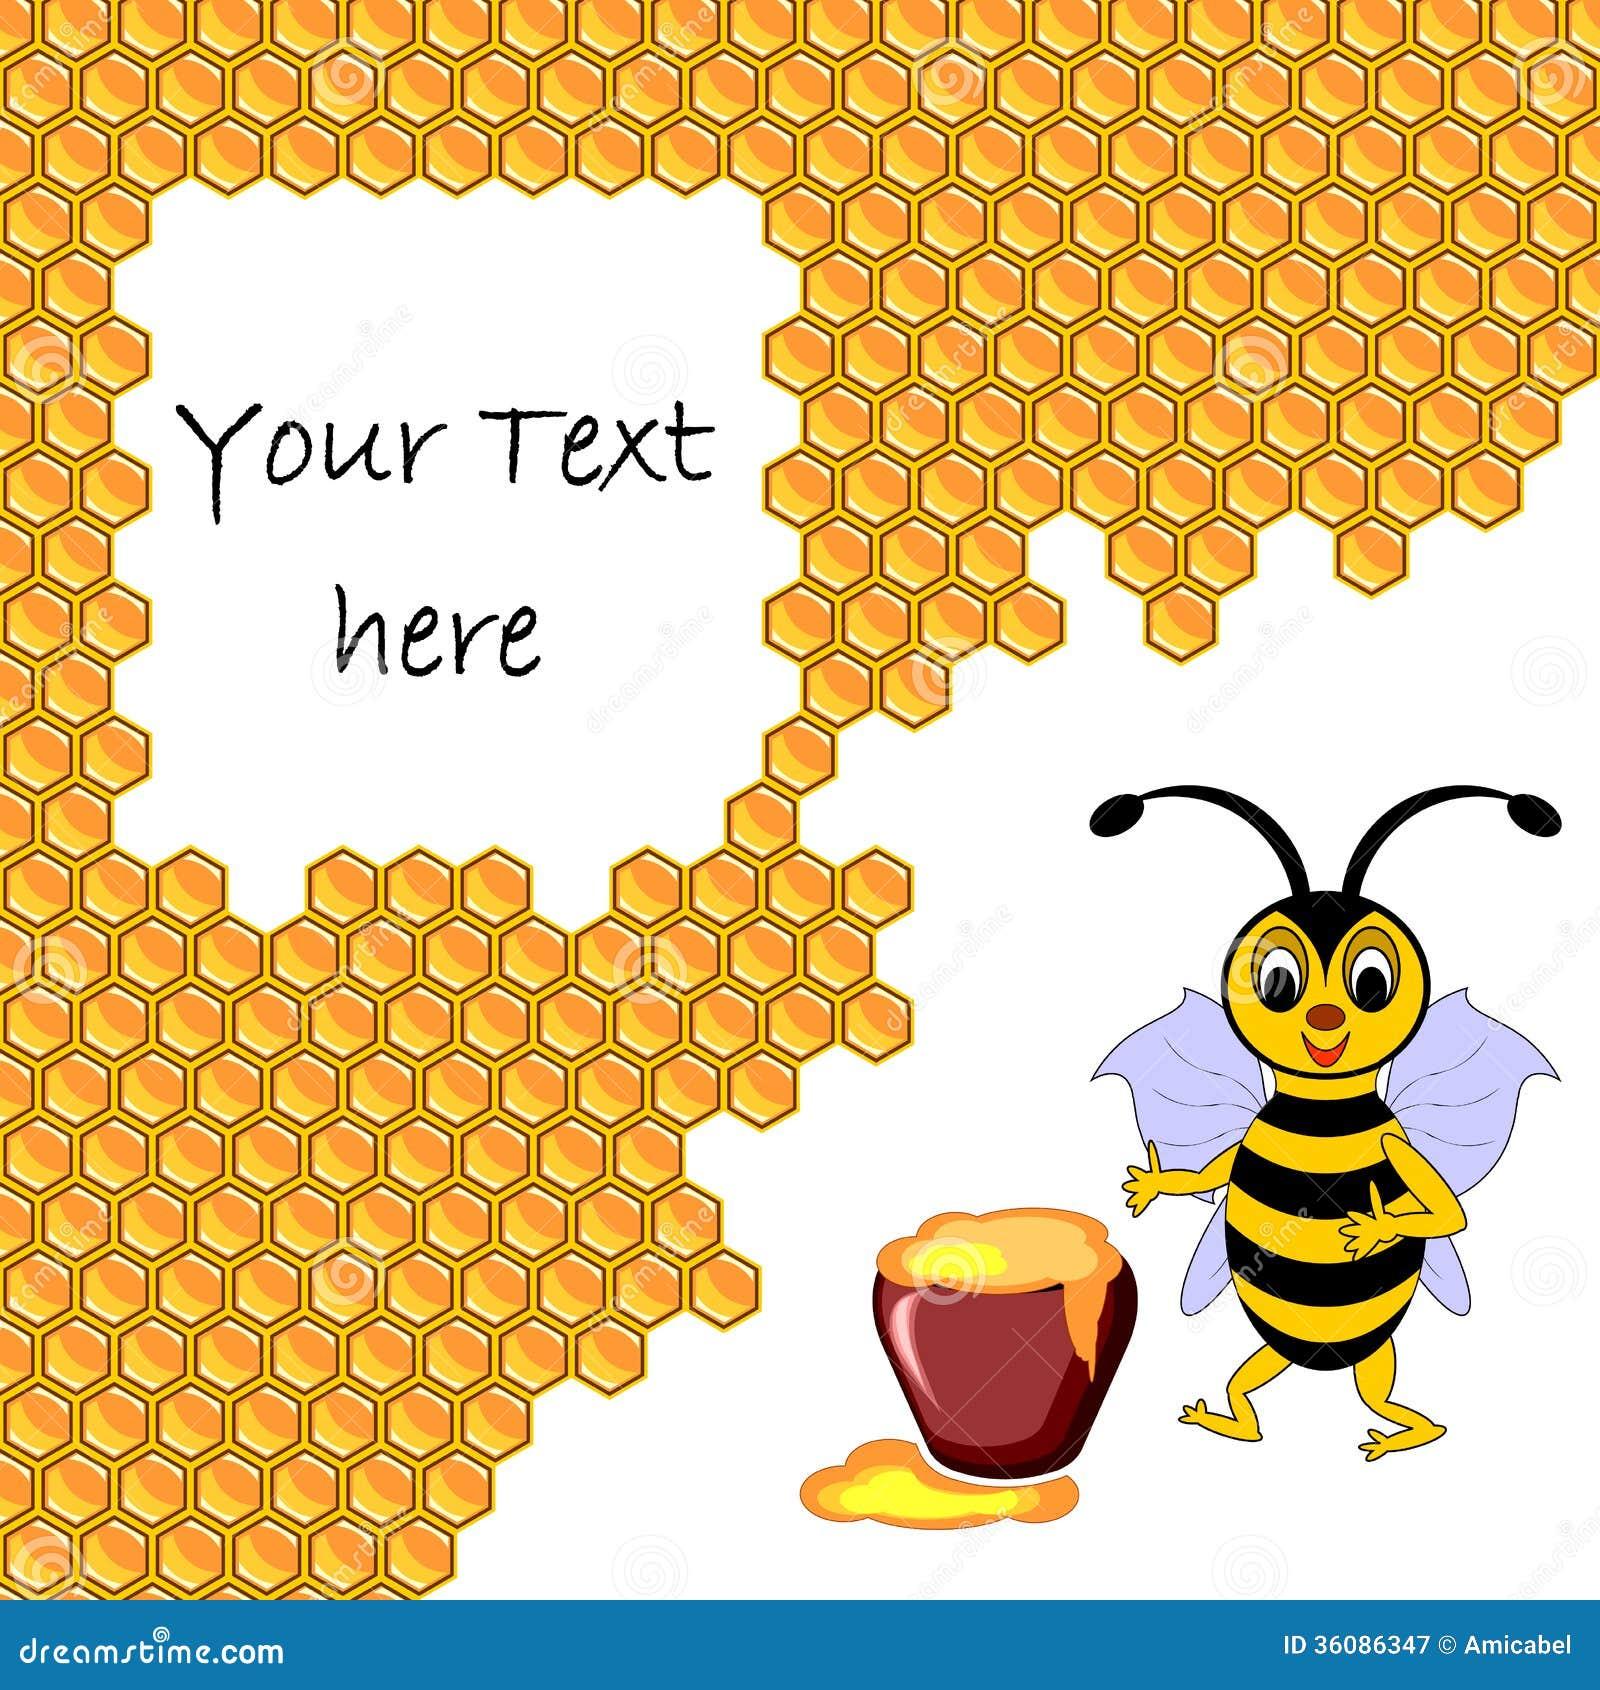 beehive honey business plan